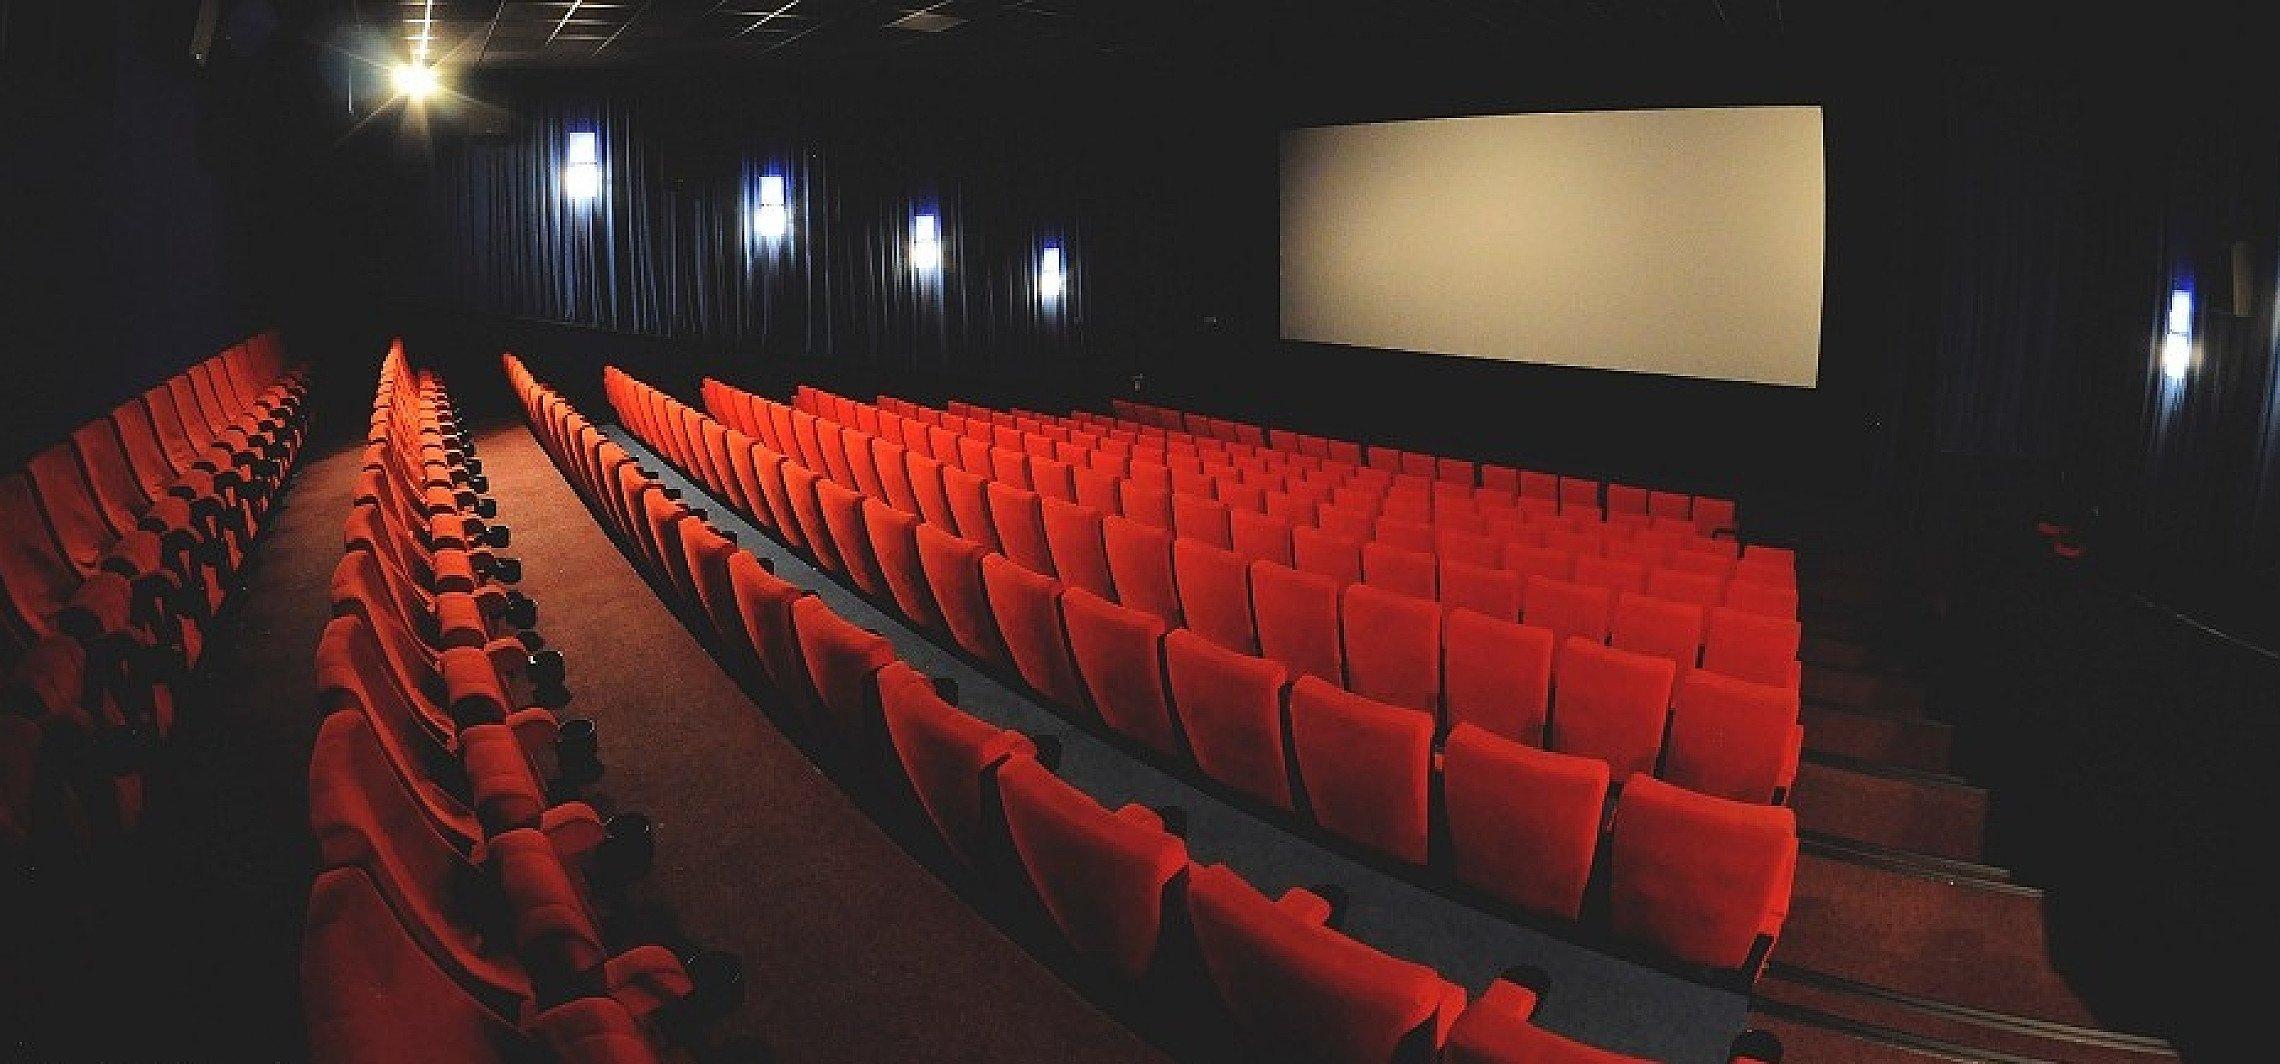 Www Kino Onlain